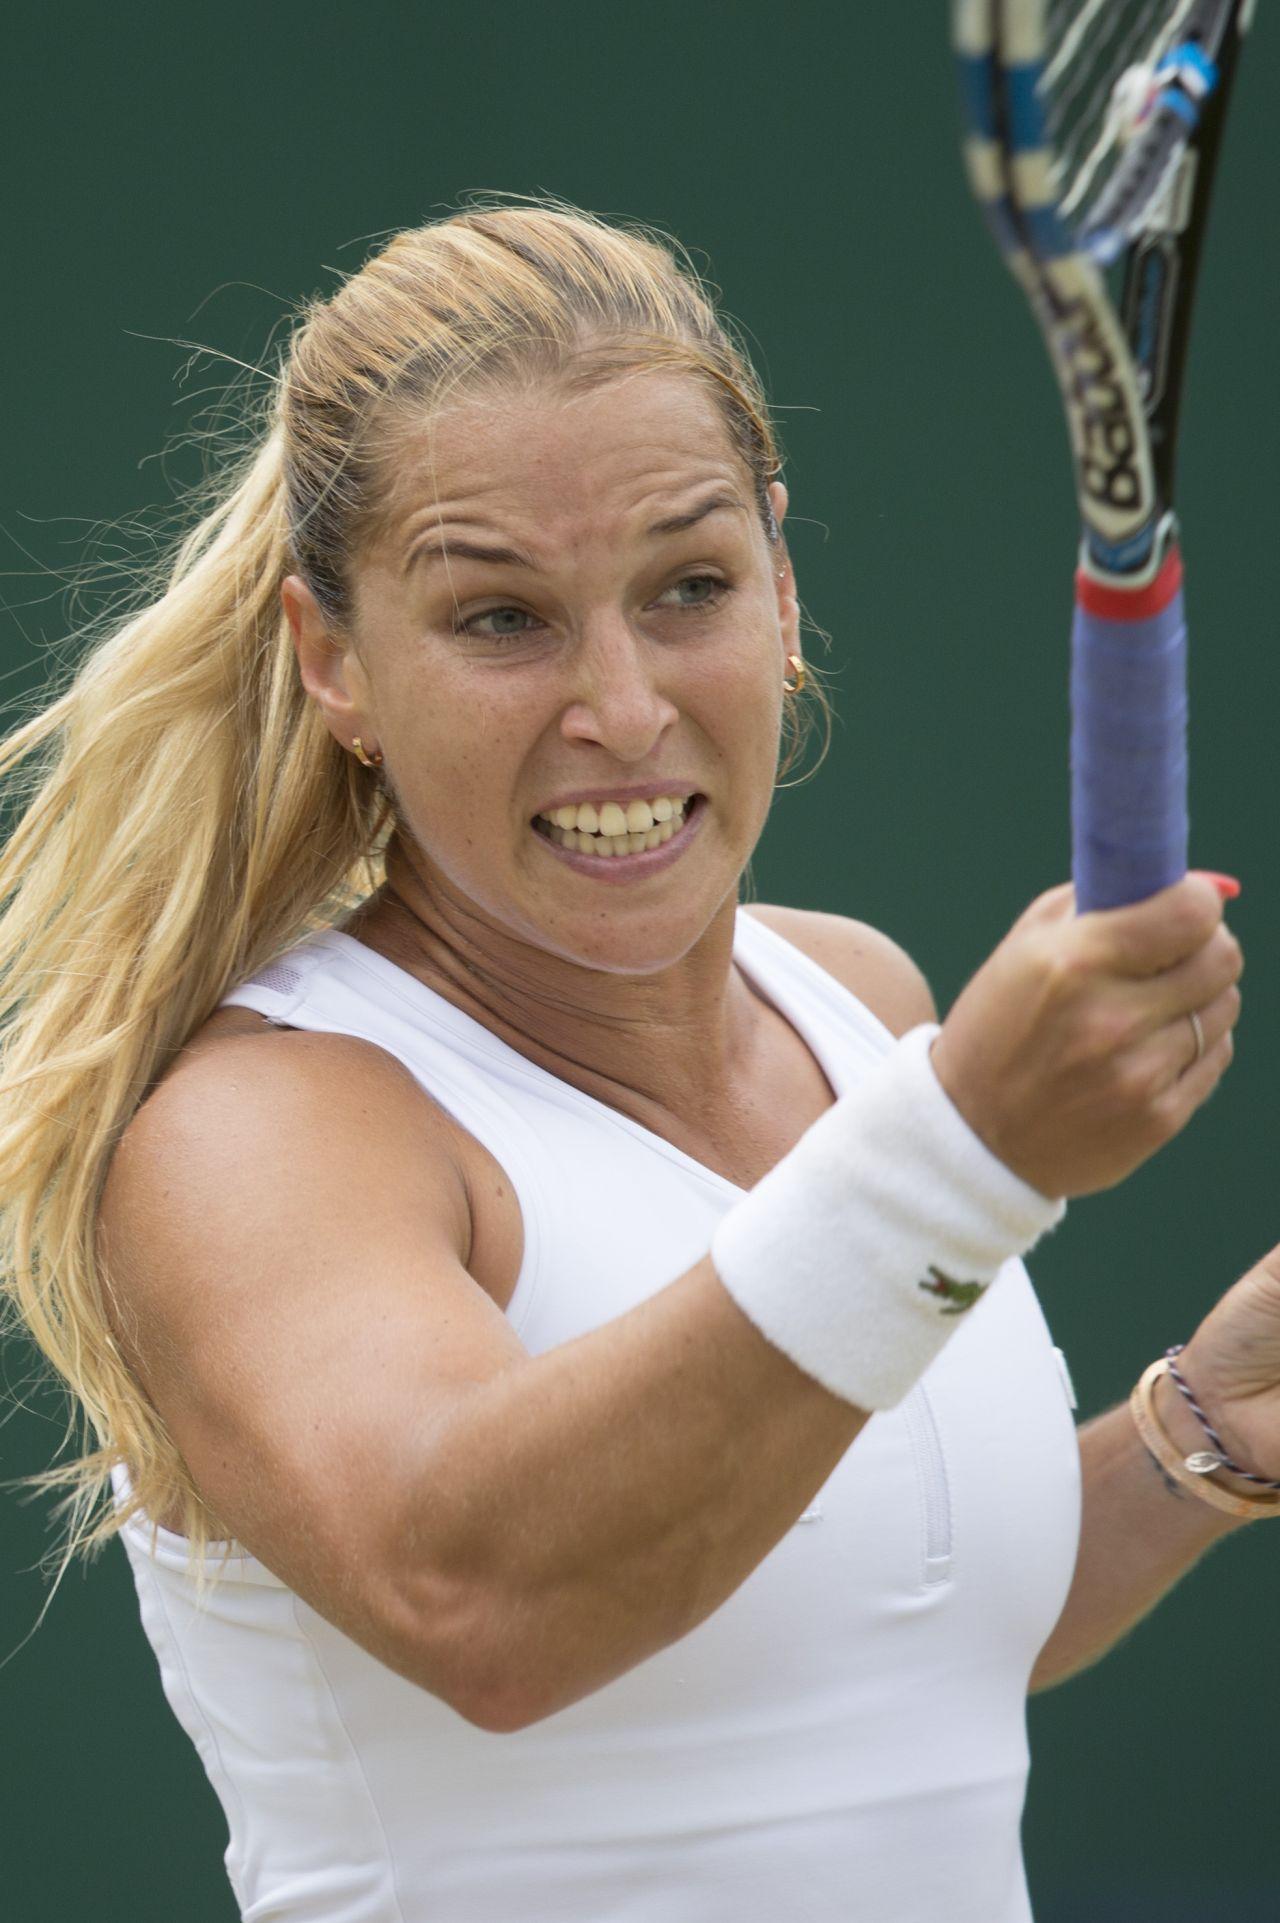 Dominika Cibulkova  Wimbledon Tennis Championships in - 4Th Of July Hairstyles